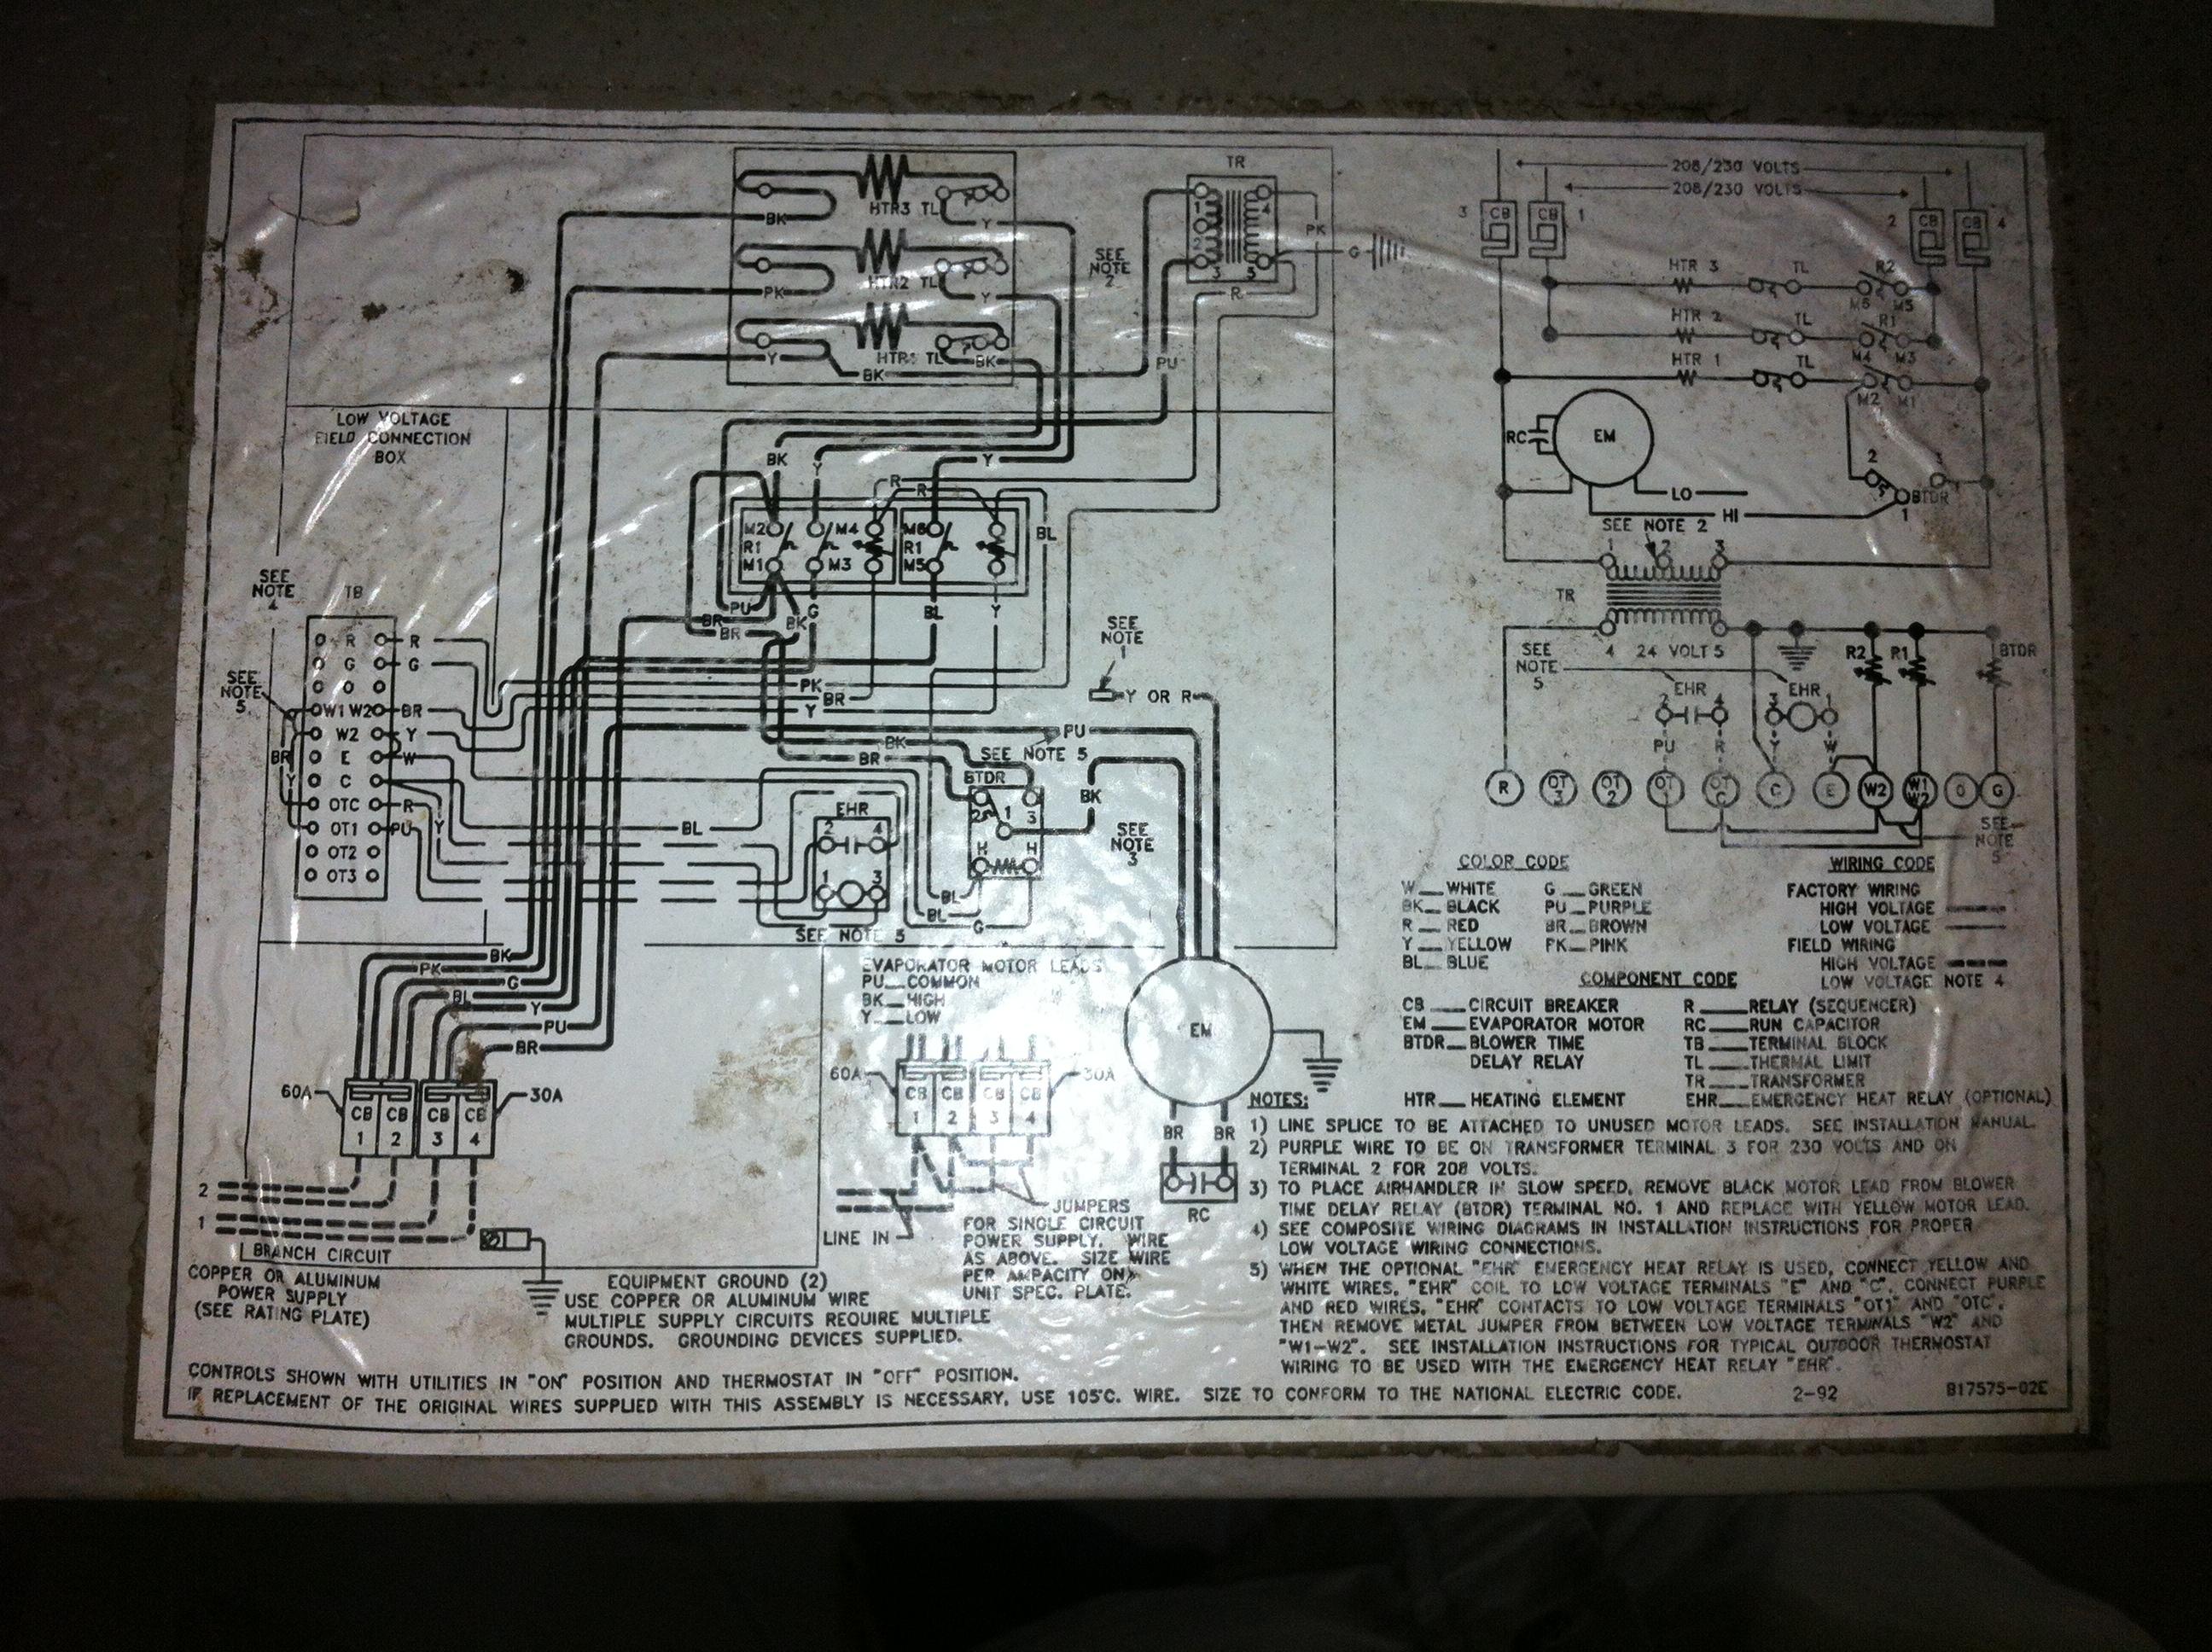 My Goodman Janitrol  A36  The System In